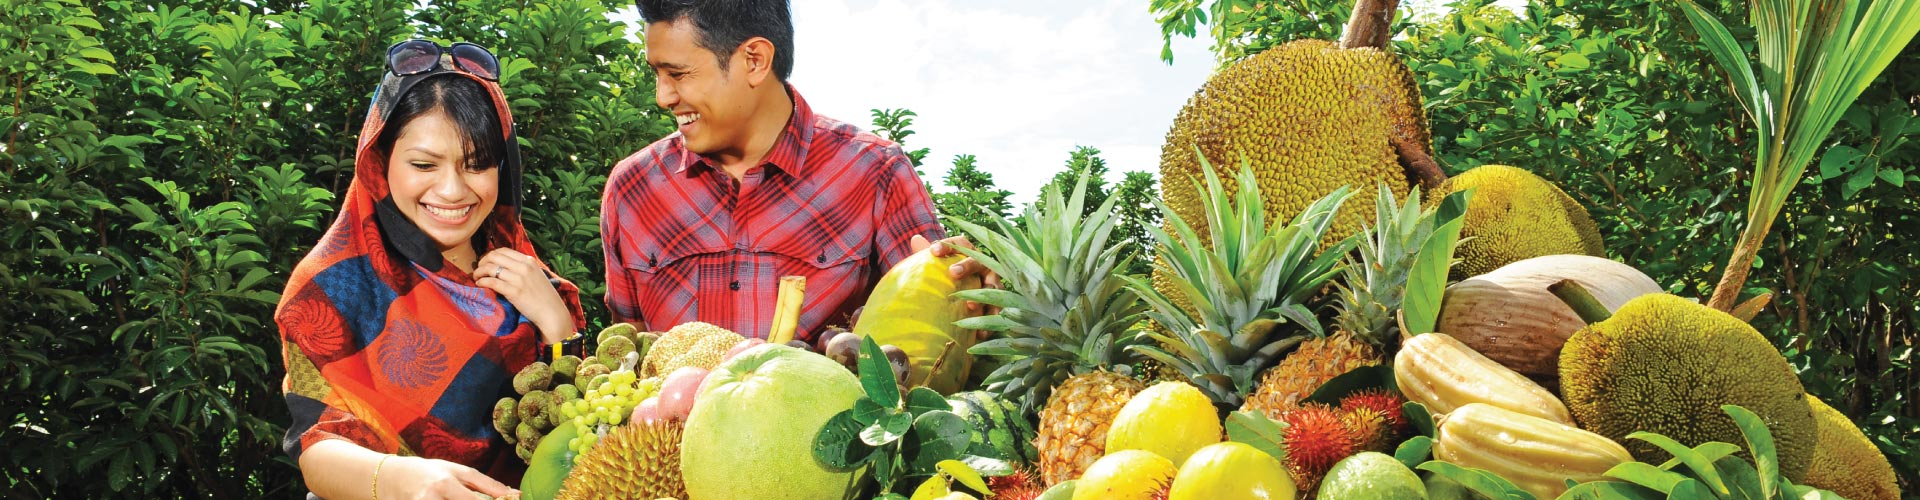 Penang Orchard & Durian Tasting Tour